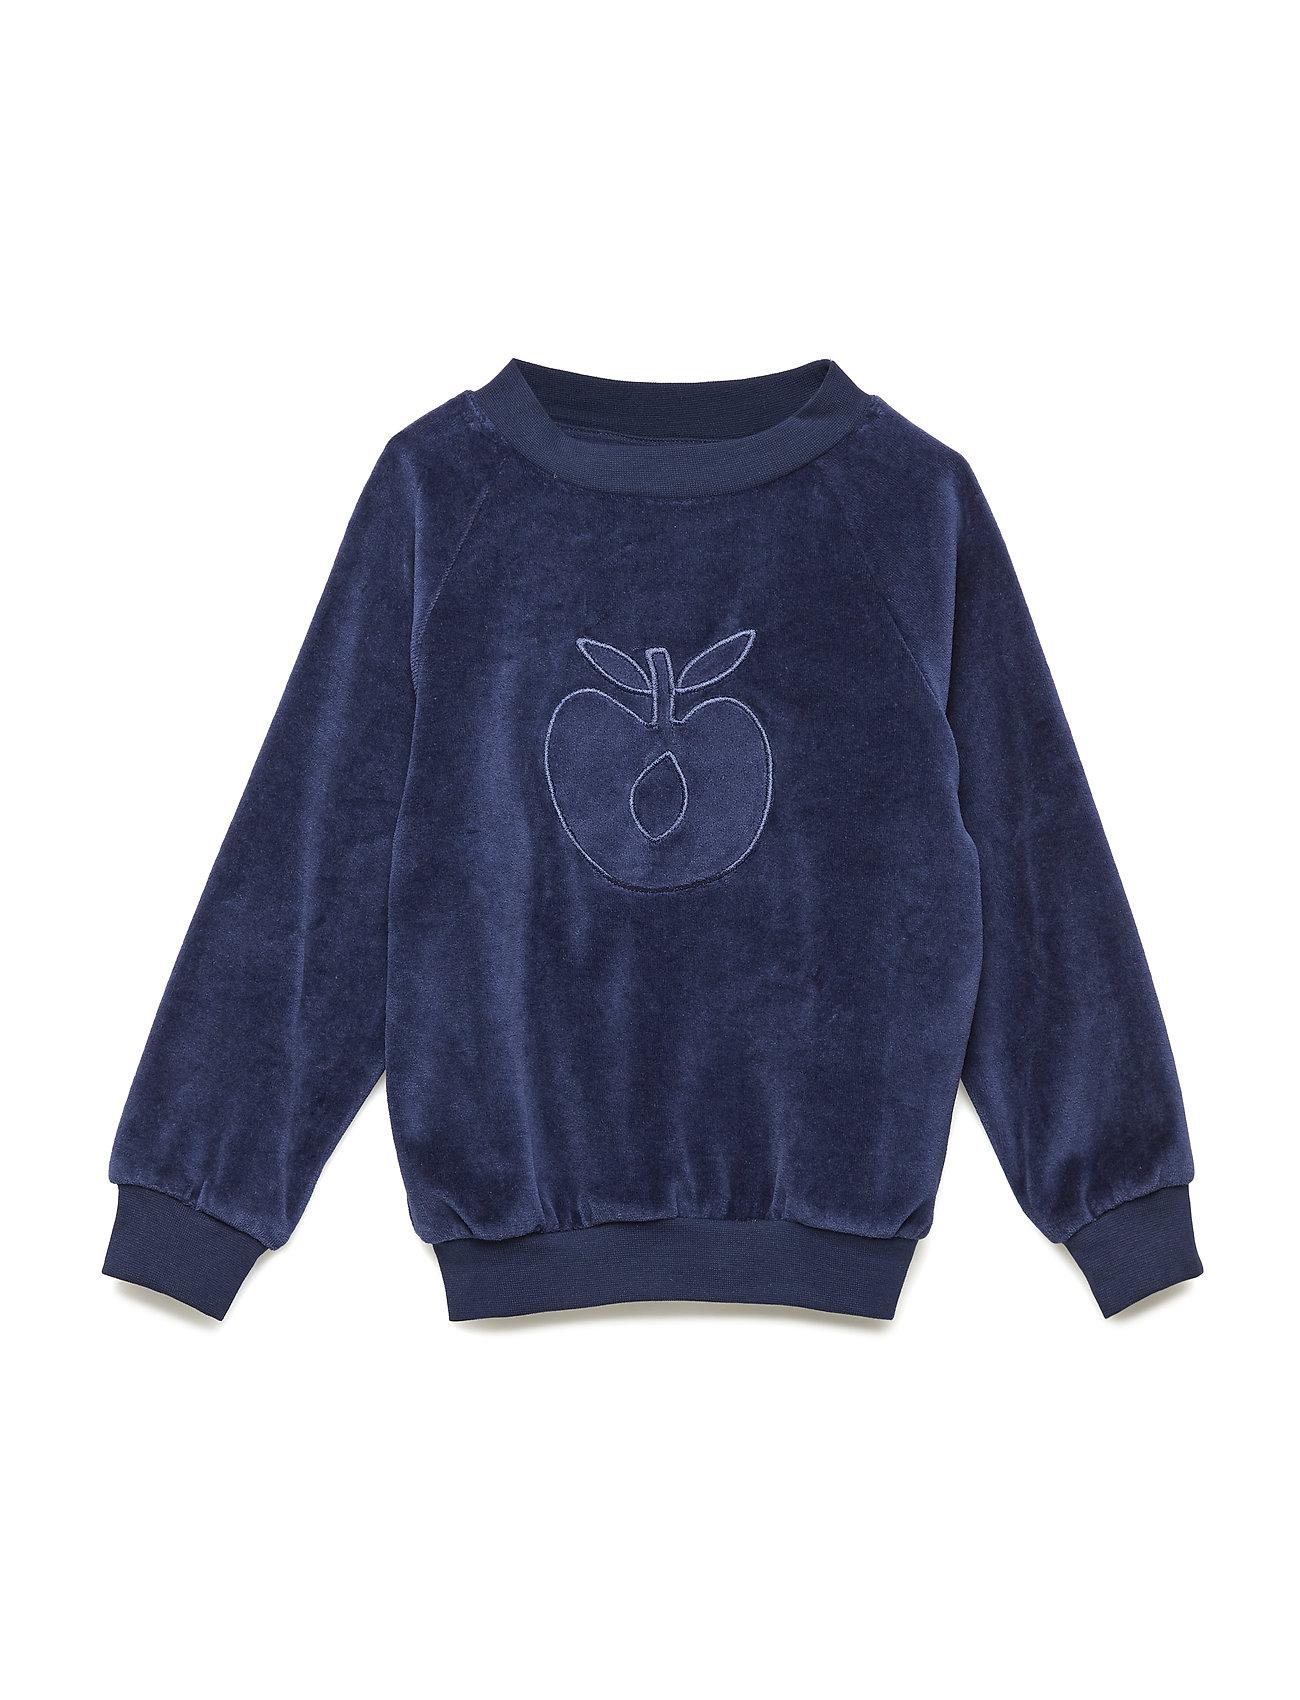 Småfolk Sweatshirt. Velvet. Apple - MEDIEVAL BLUE